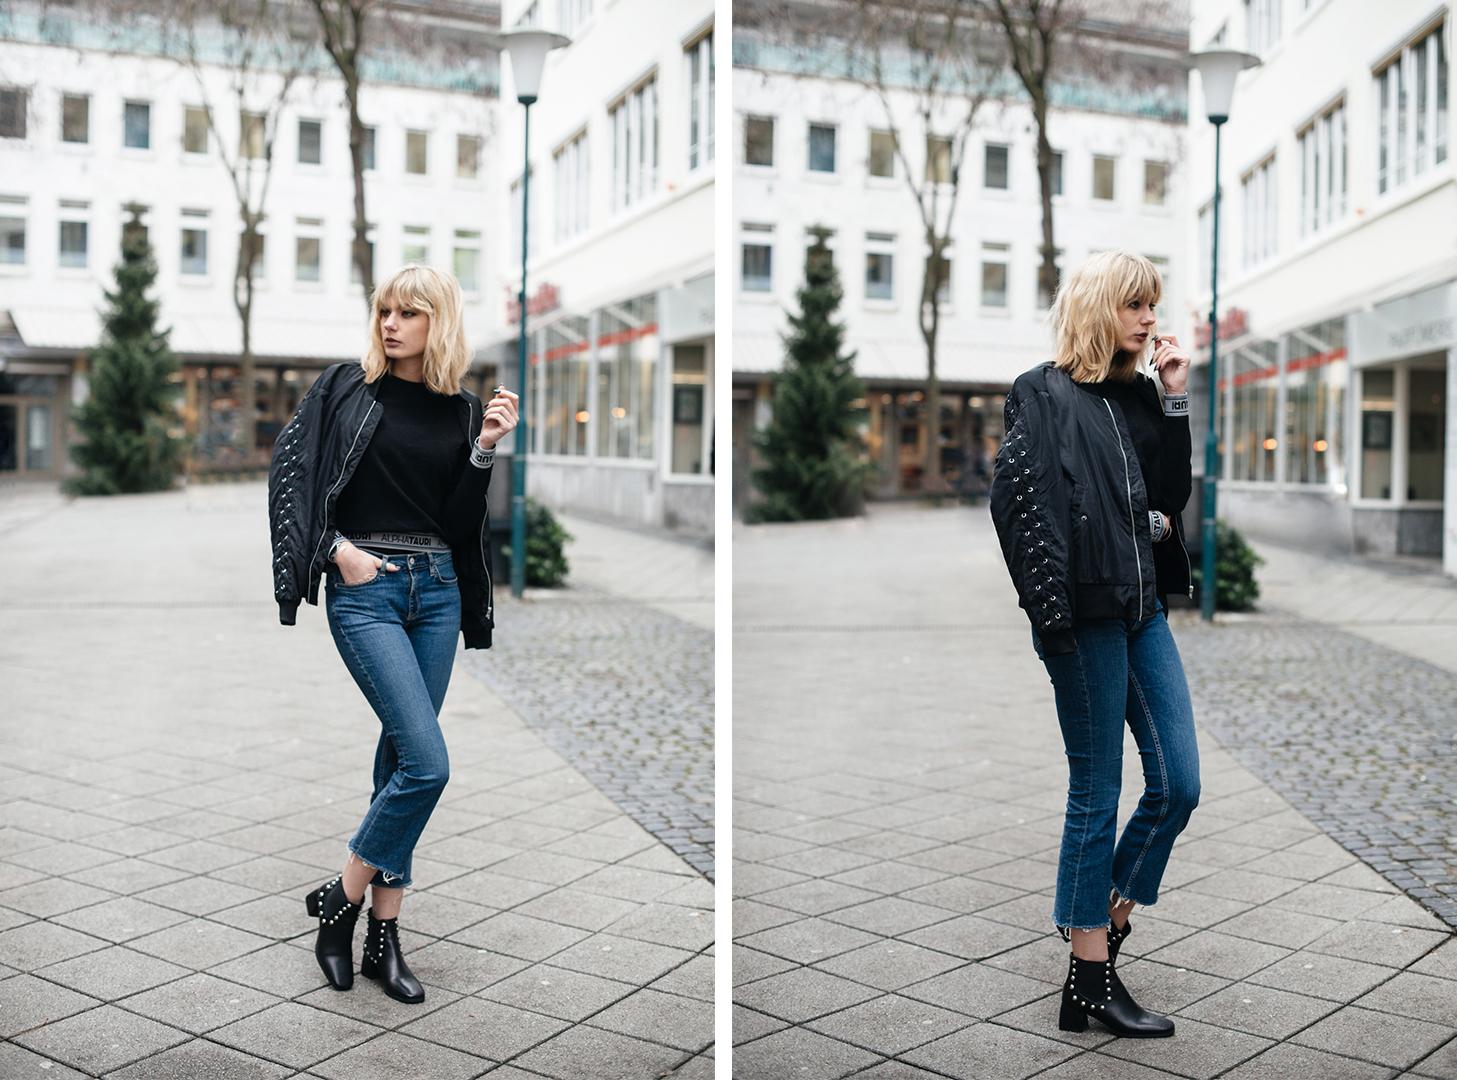 Kiamisu_Zign_Cropped Jeans ausgfranst_Mango_Schuhe_Leo Schal_Outfit_Inspiration_Fashionblog_Modeblog_Kiamisu-collage-1--2